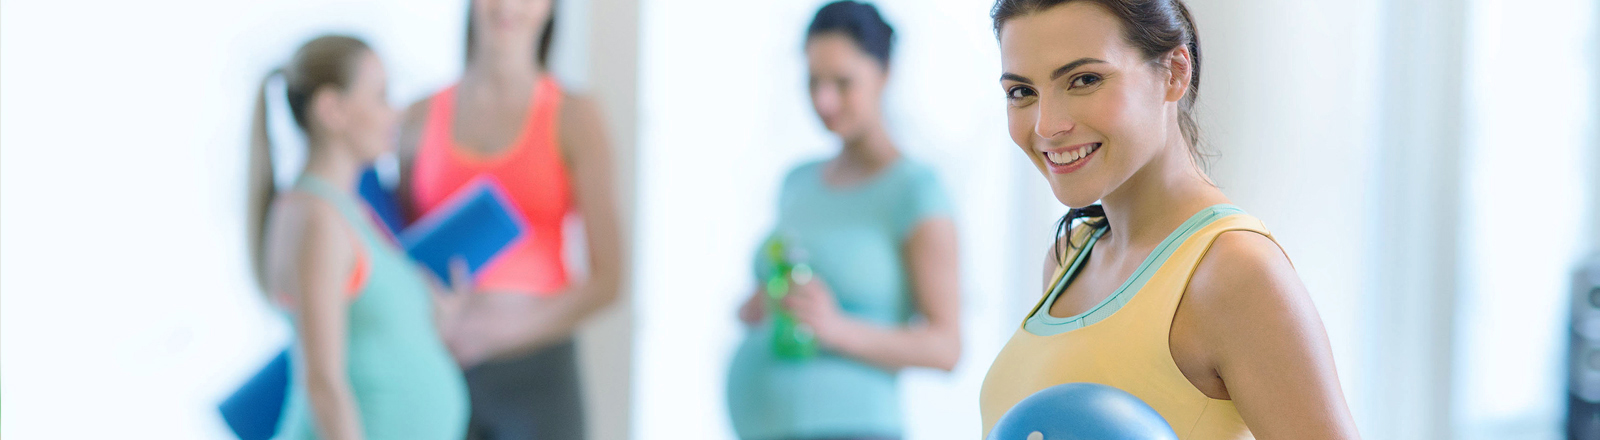 recuperacion post parto fisioterapia de la mujer